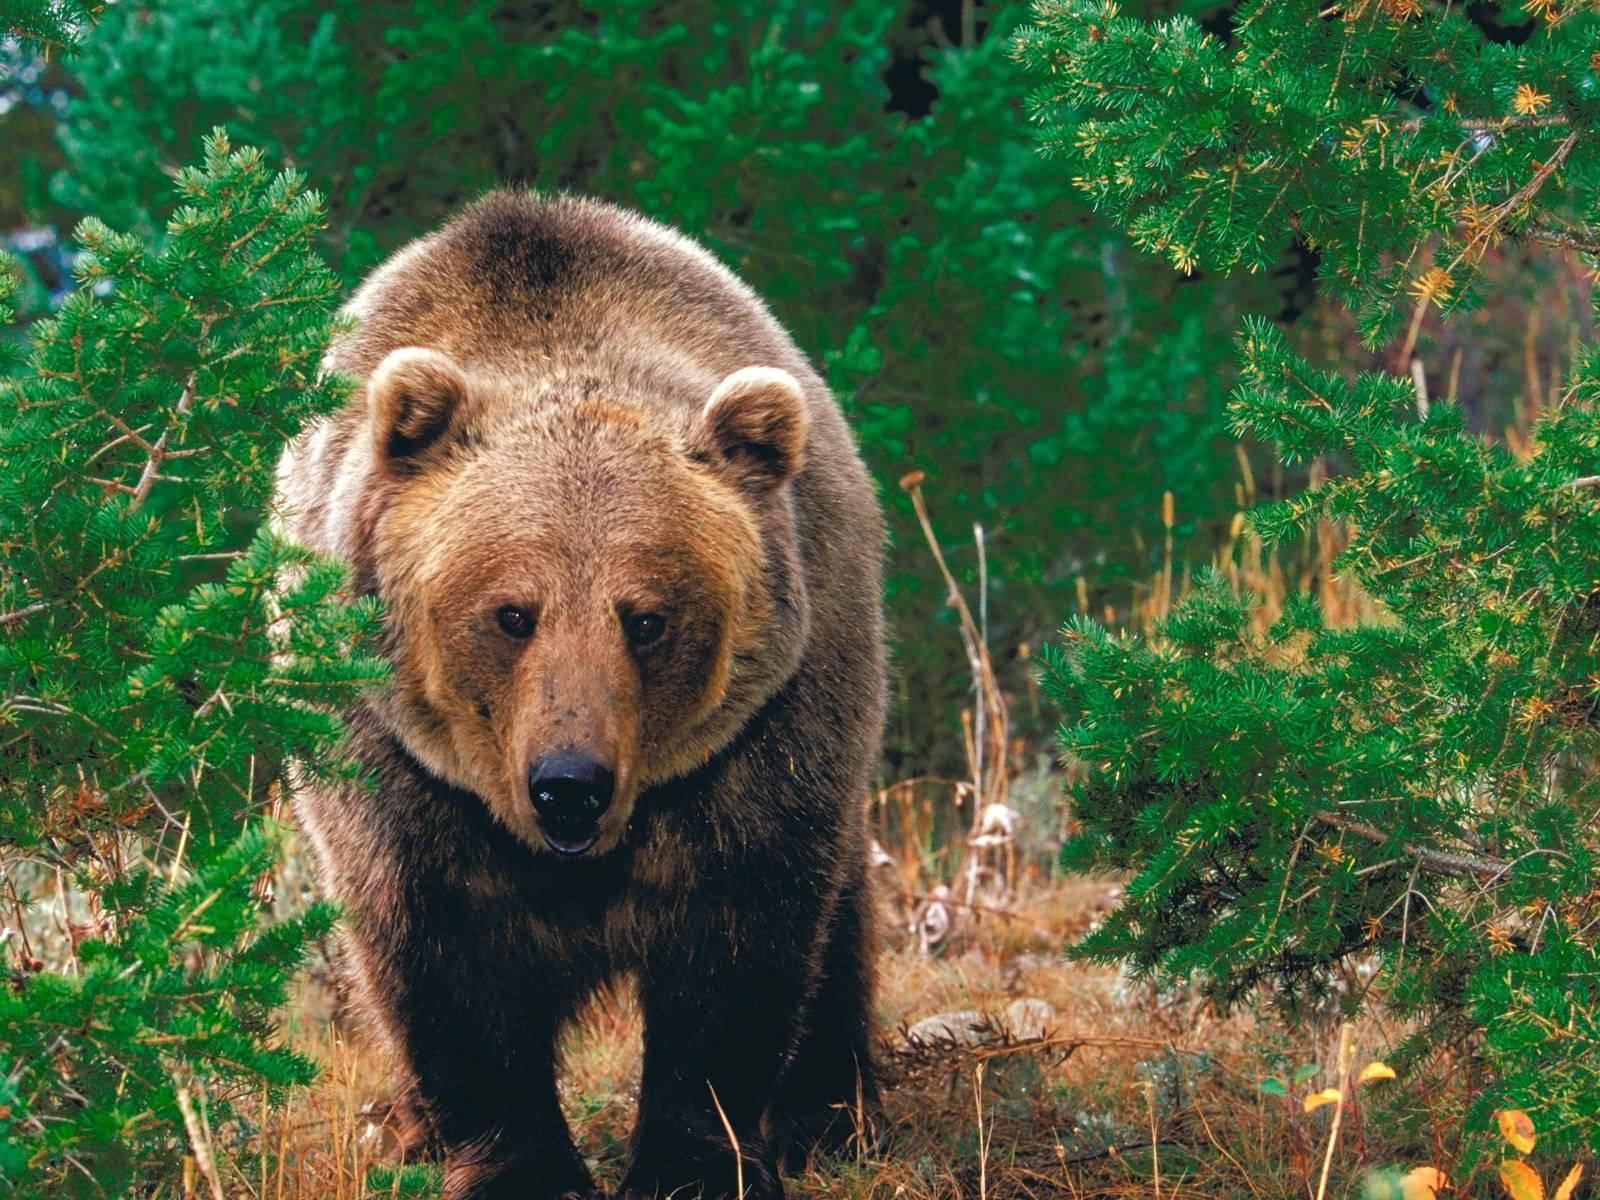 http://1.bp.blogspot.com/_B8BcVmBUiDk/TNlQPpXcpWI/AAAAAAAAAsA/KSKq2r8-xmY/s1600/Forest_Wild_Grizzly_Bear-1600x1200.jpg